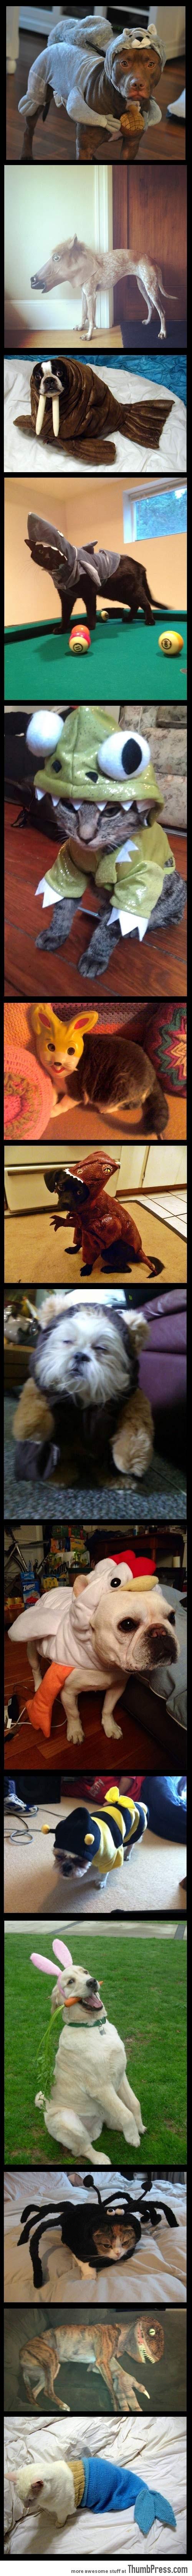 ANIMALS DRESSED UP AS ANIMALS.